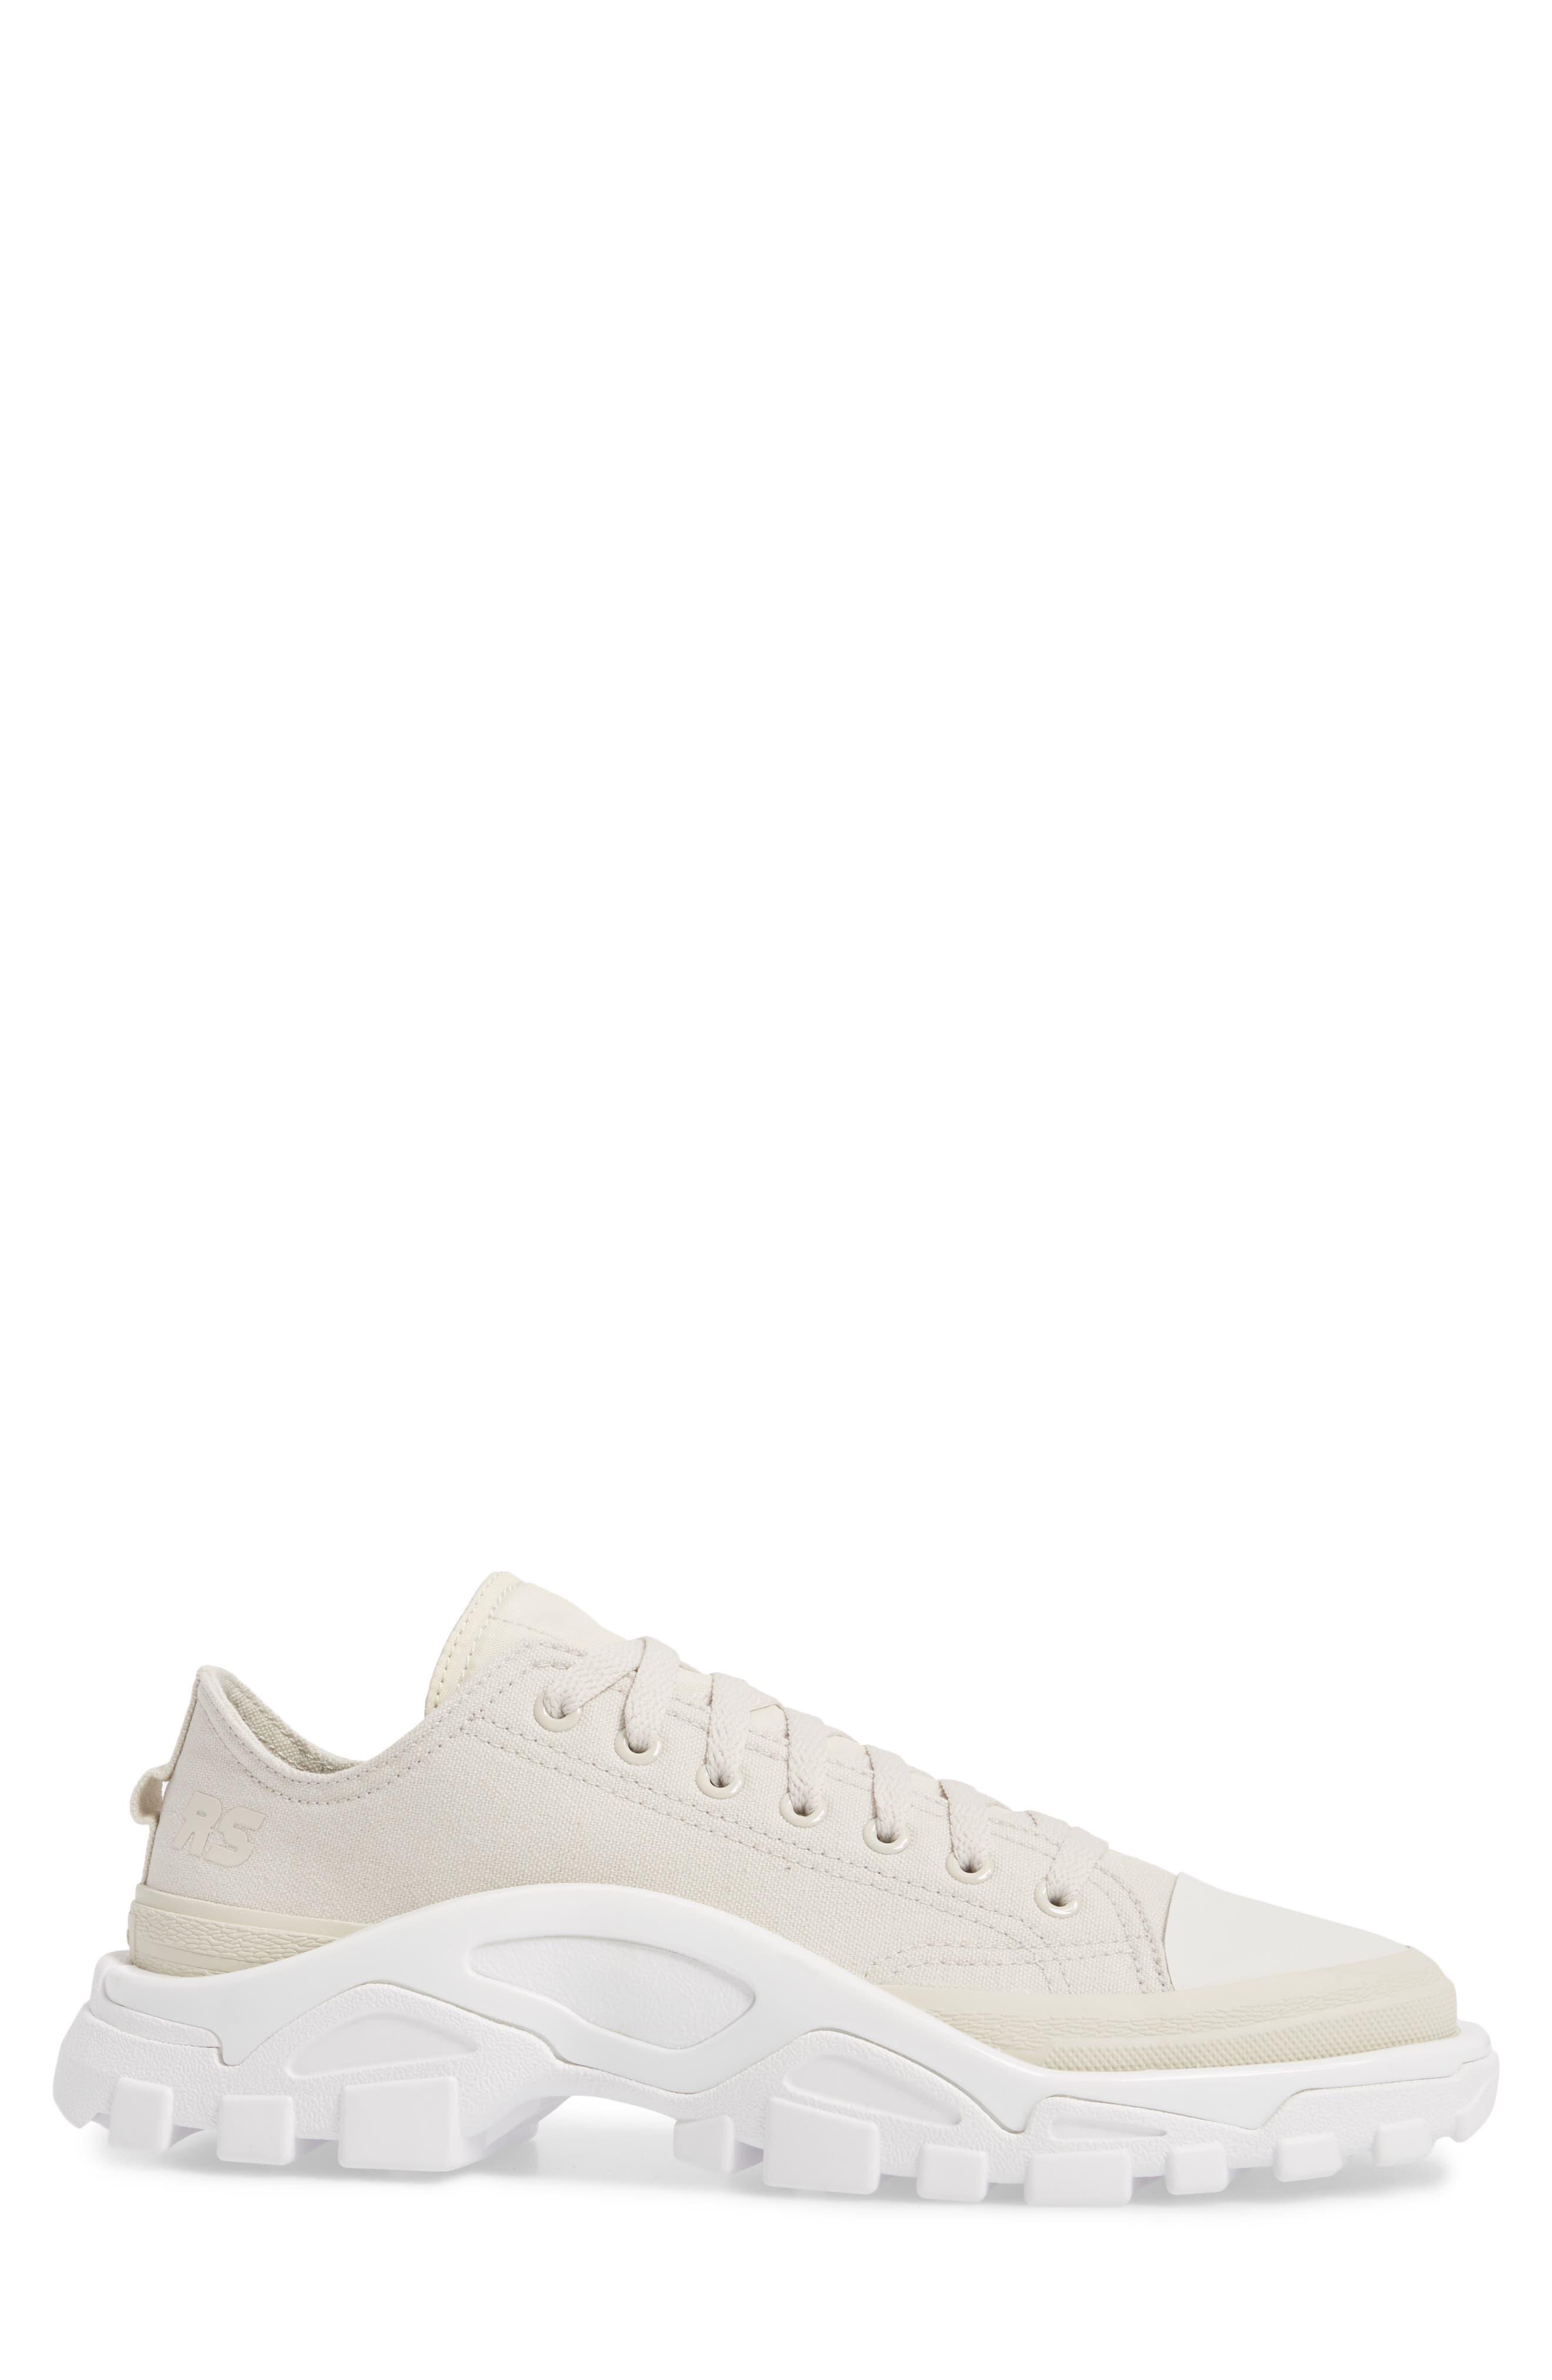 Detroit Low Top Sneaker,                             Alternate thumbnail 3, color,                             Beige/ White